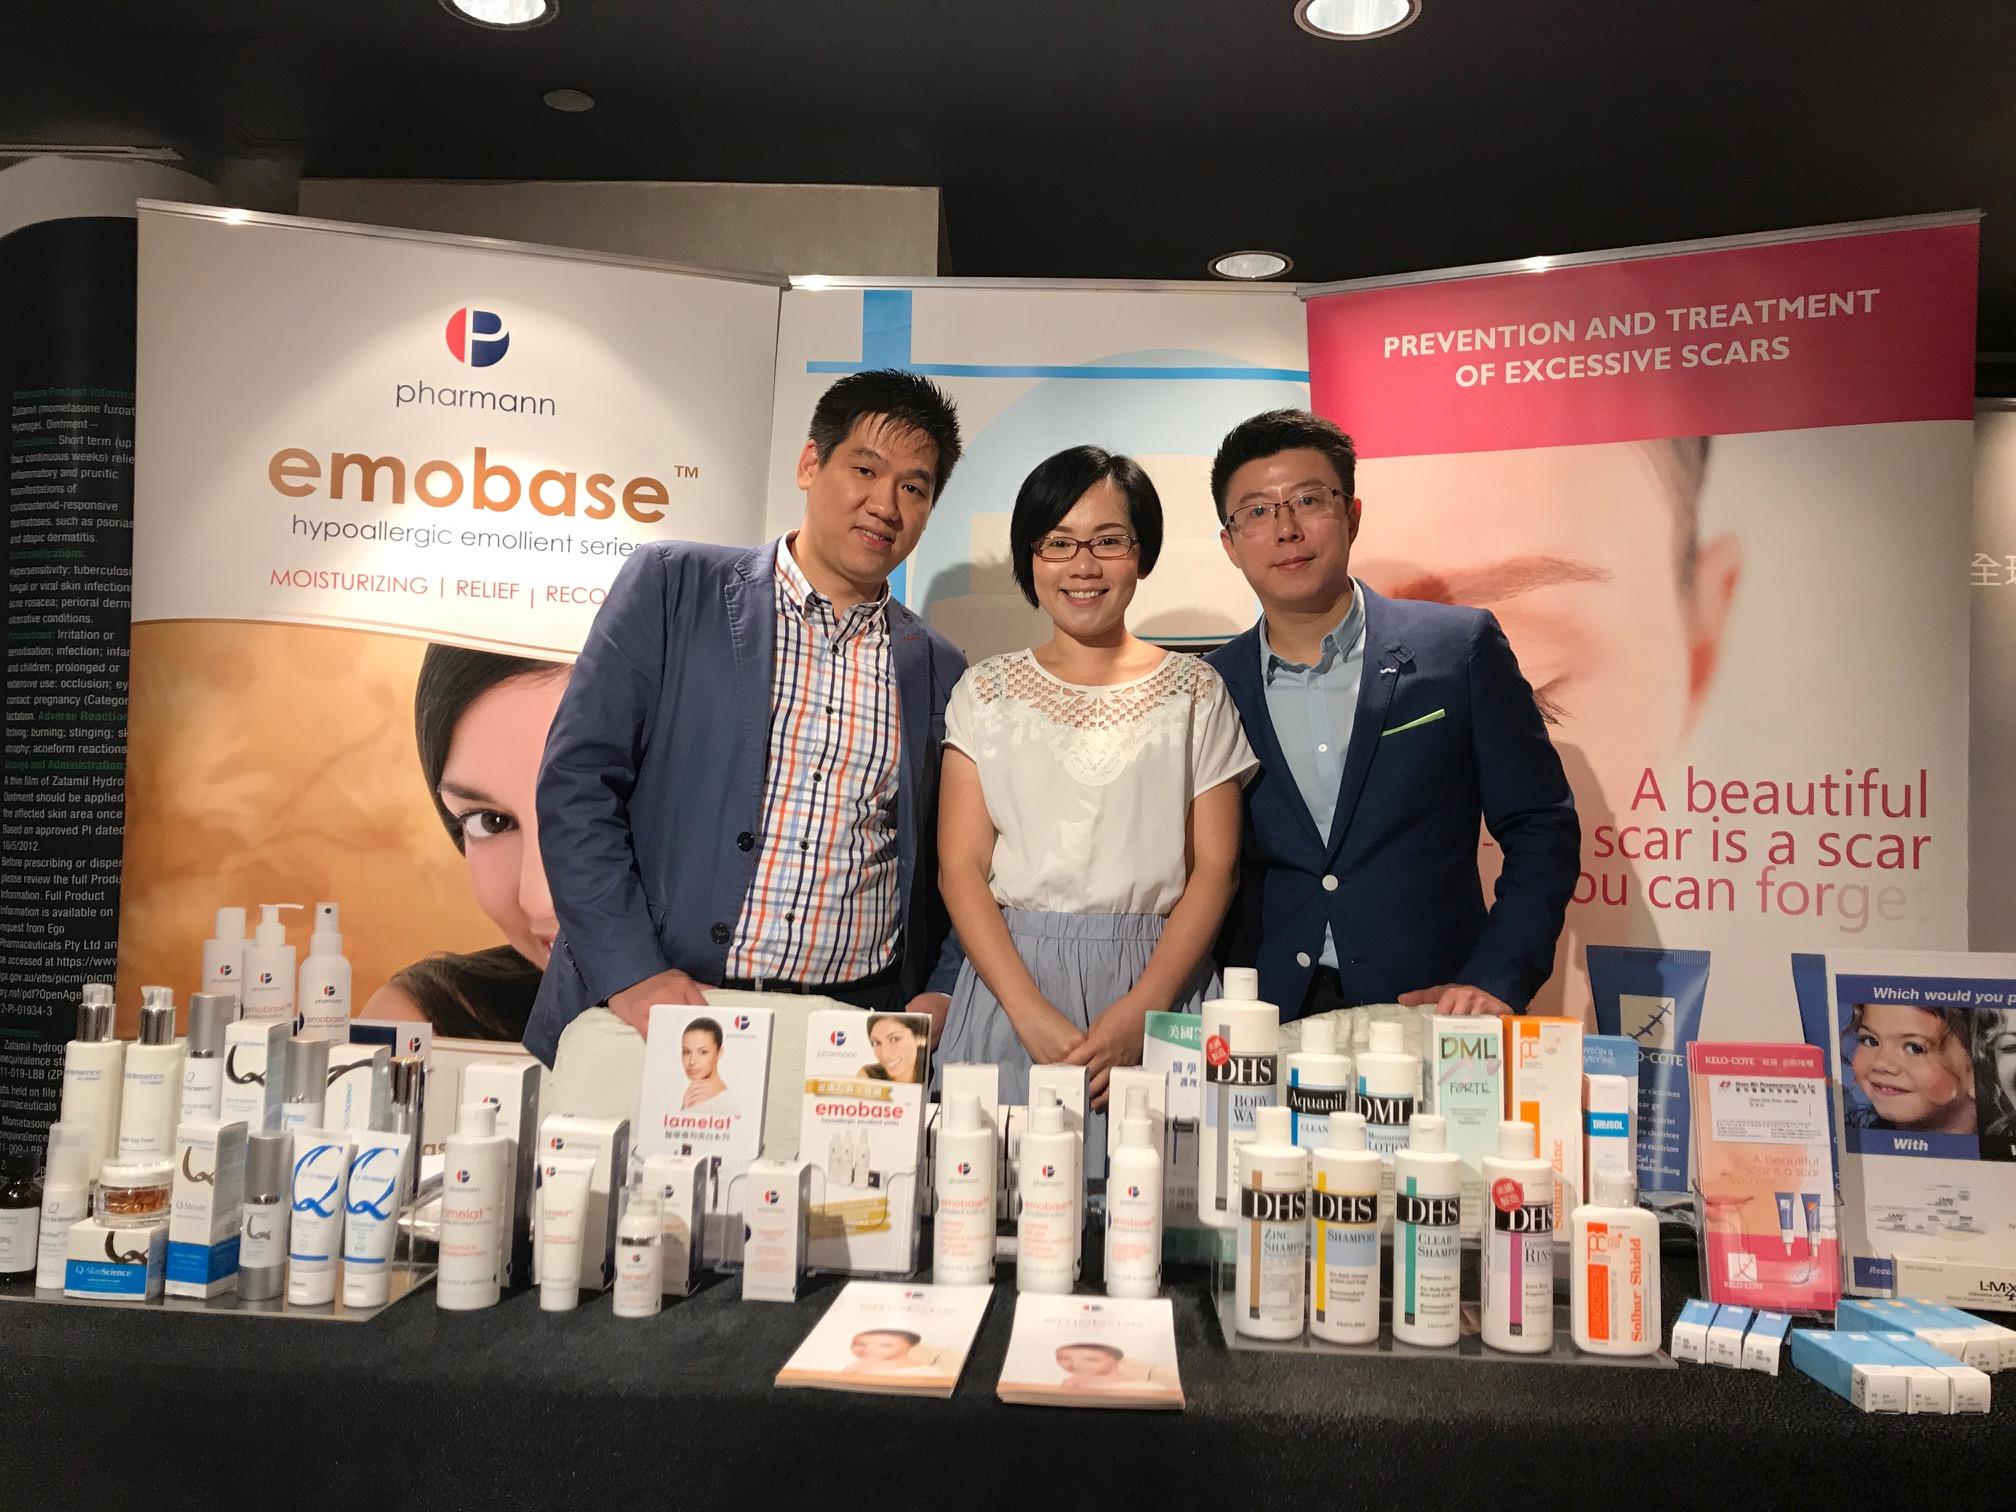 dermatology-conference2.jpg